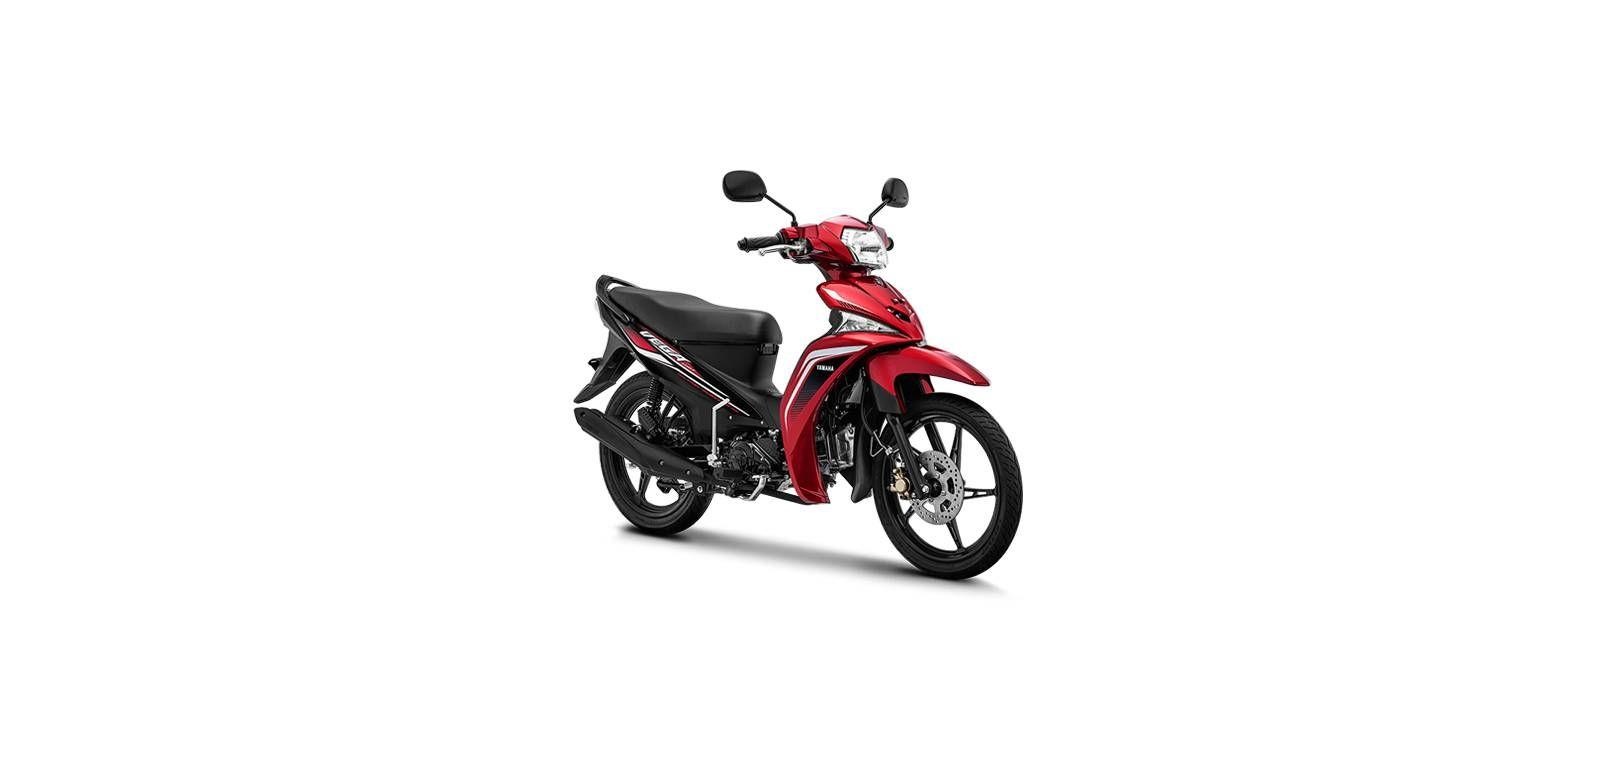 Ini Dia Warna-warna Metallic Baru Yamaha Vega Force